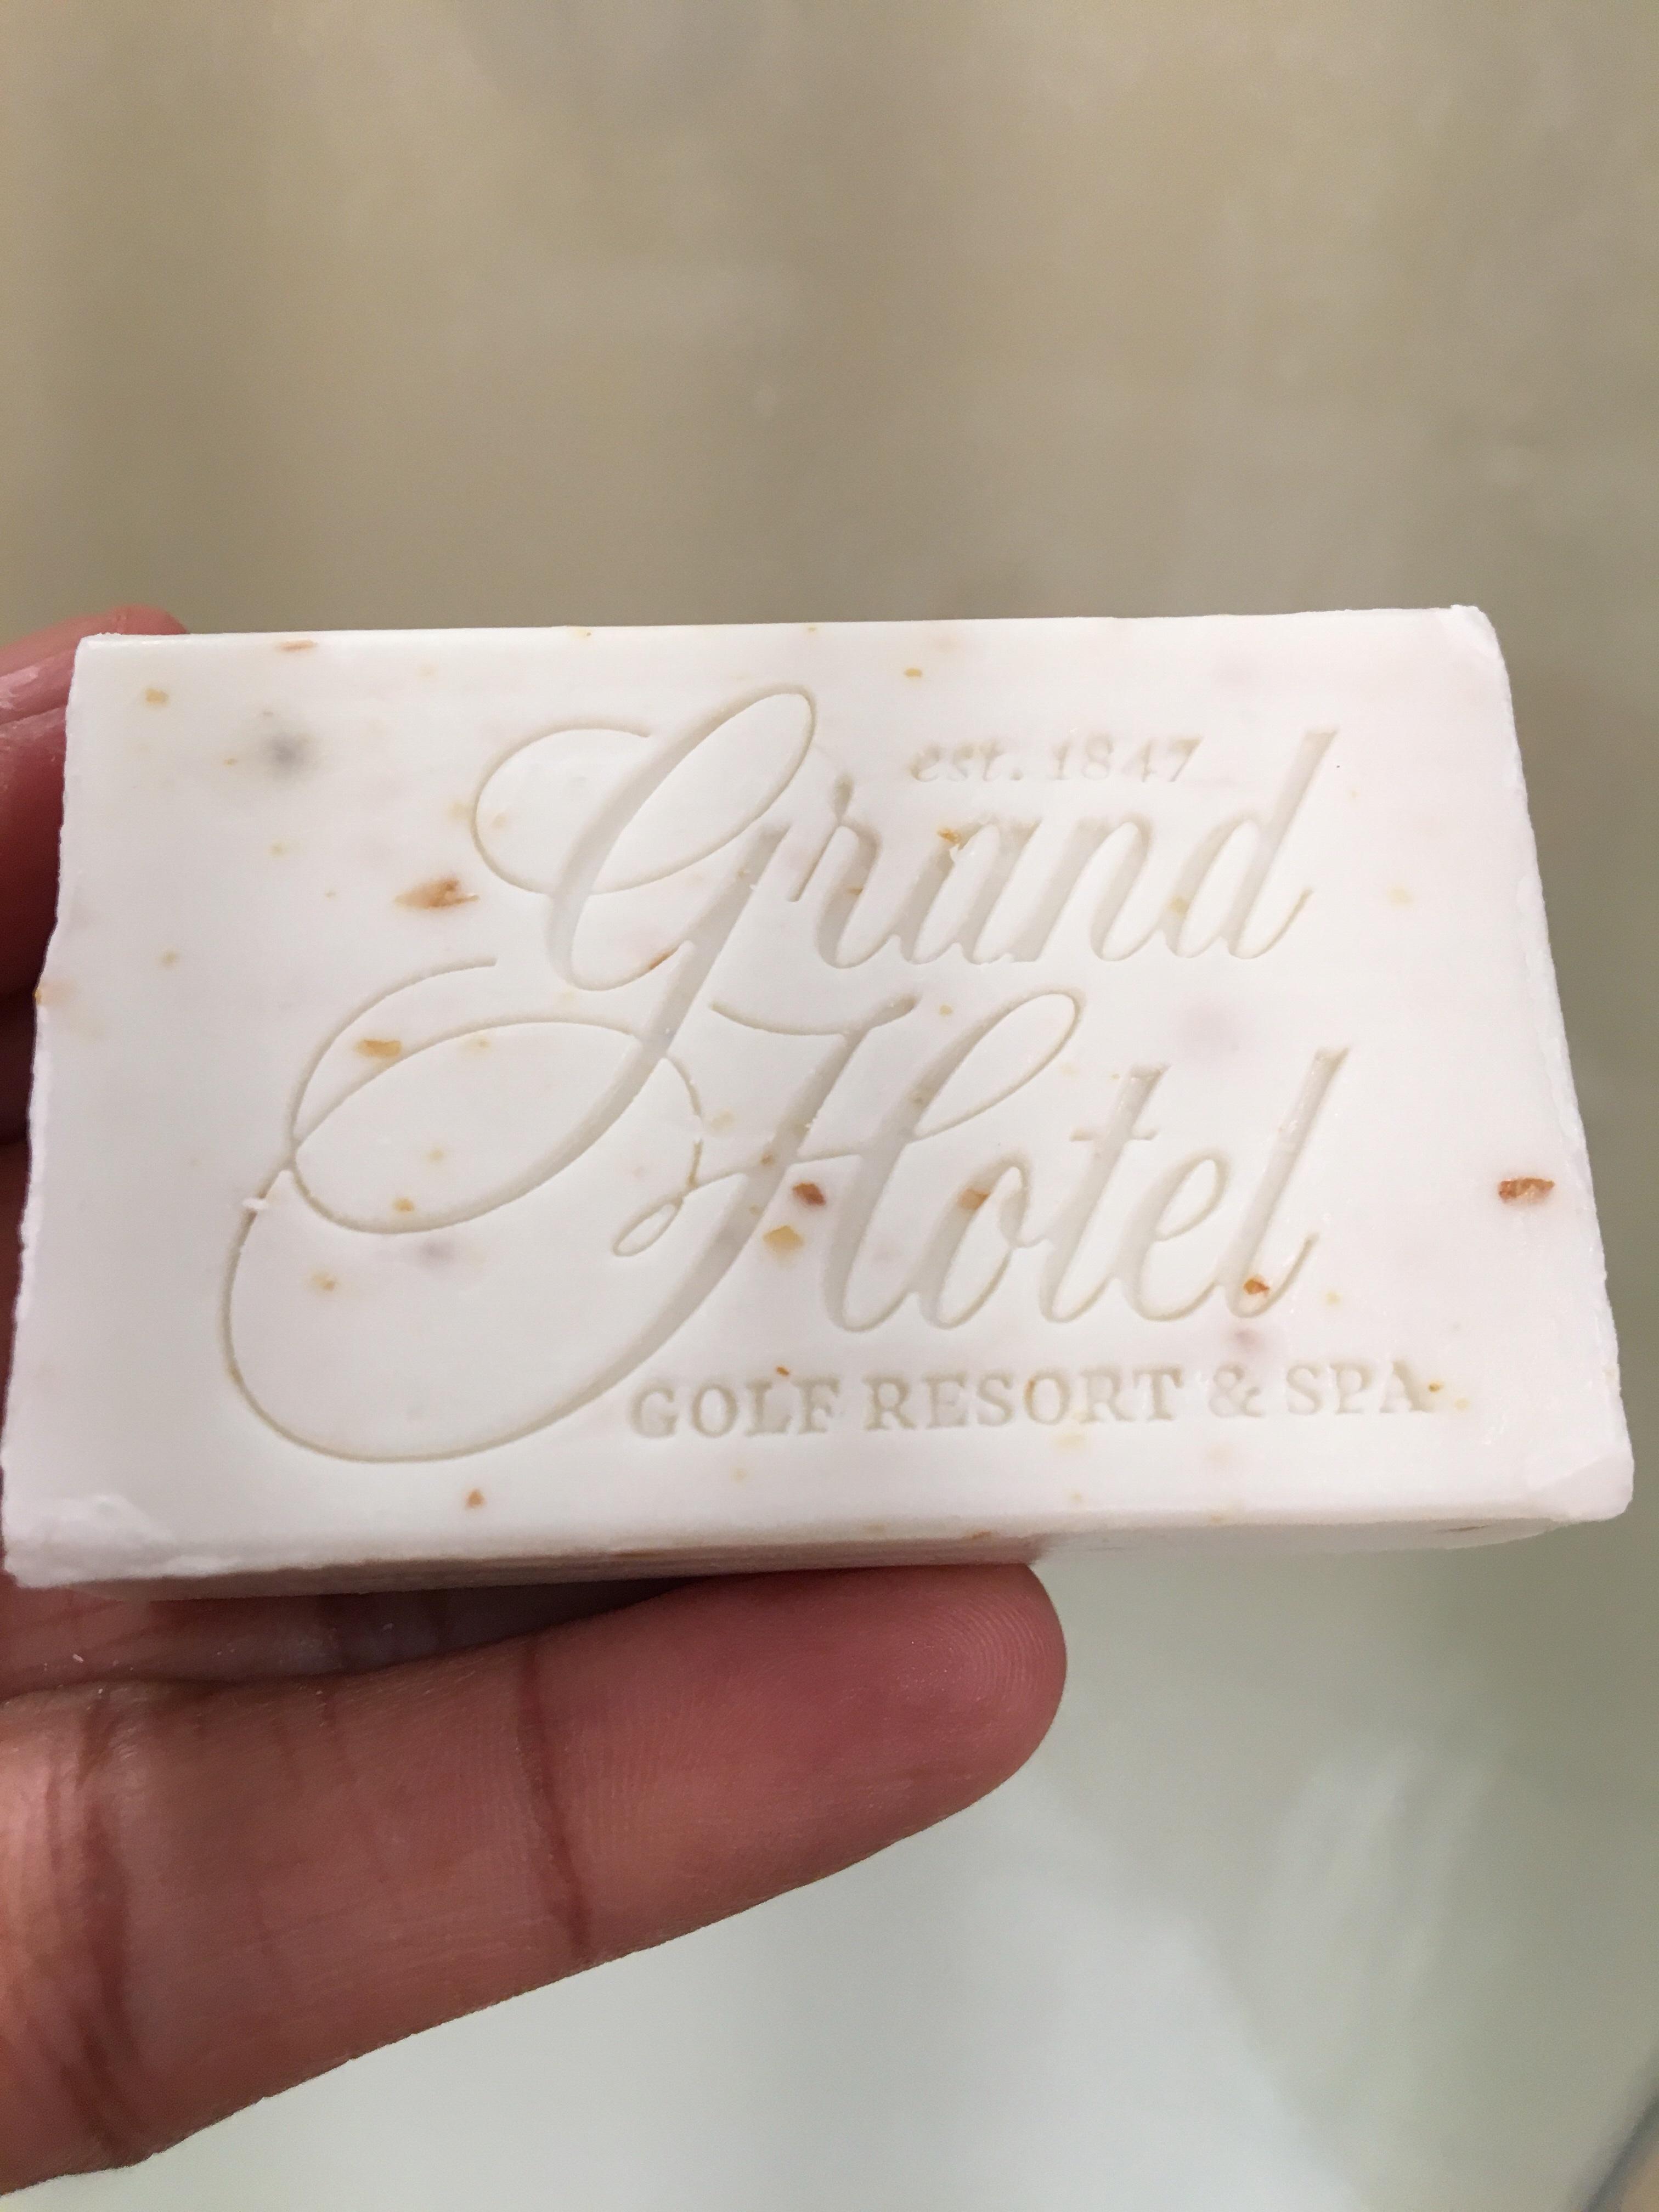 Grand Hotel Golf Resort & Spa